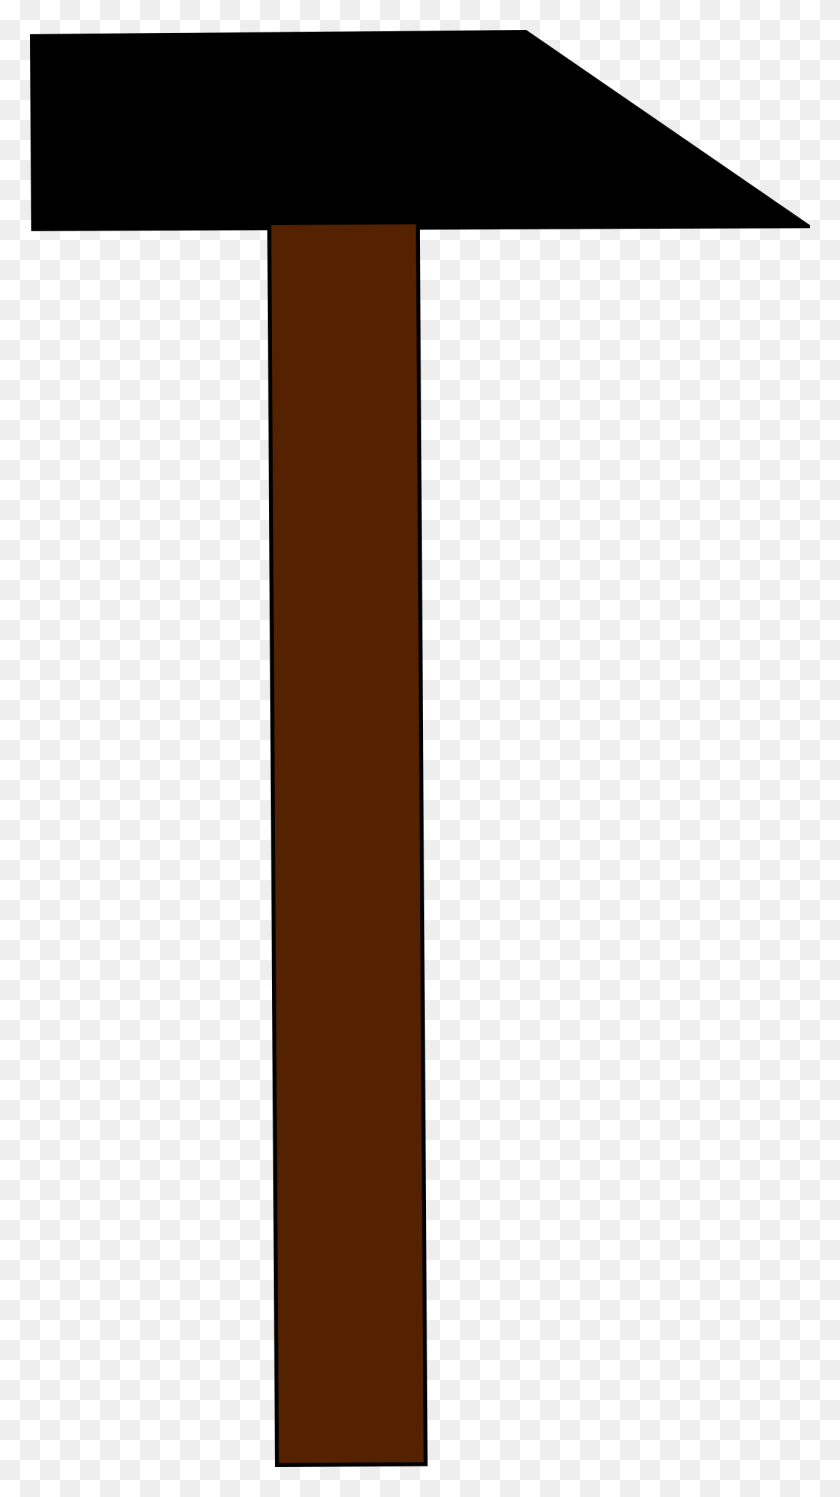 Hammer Clipart, Free Hammer Clipart - Thor Hammer Clipart